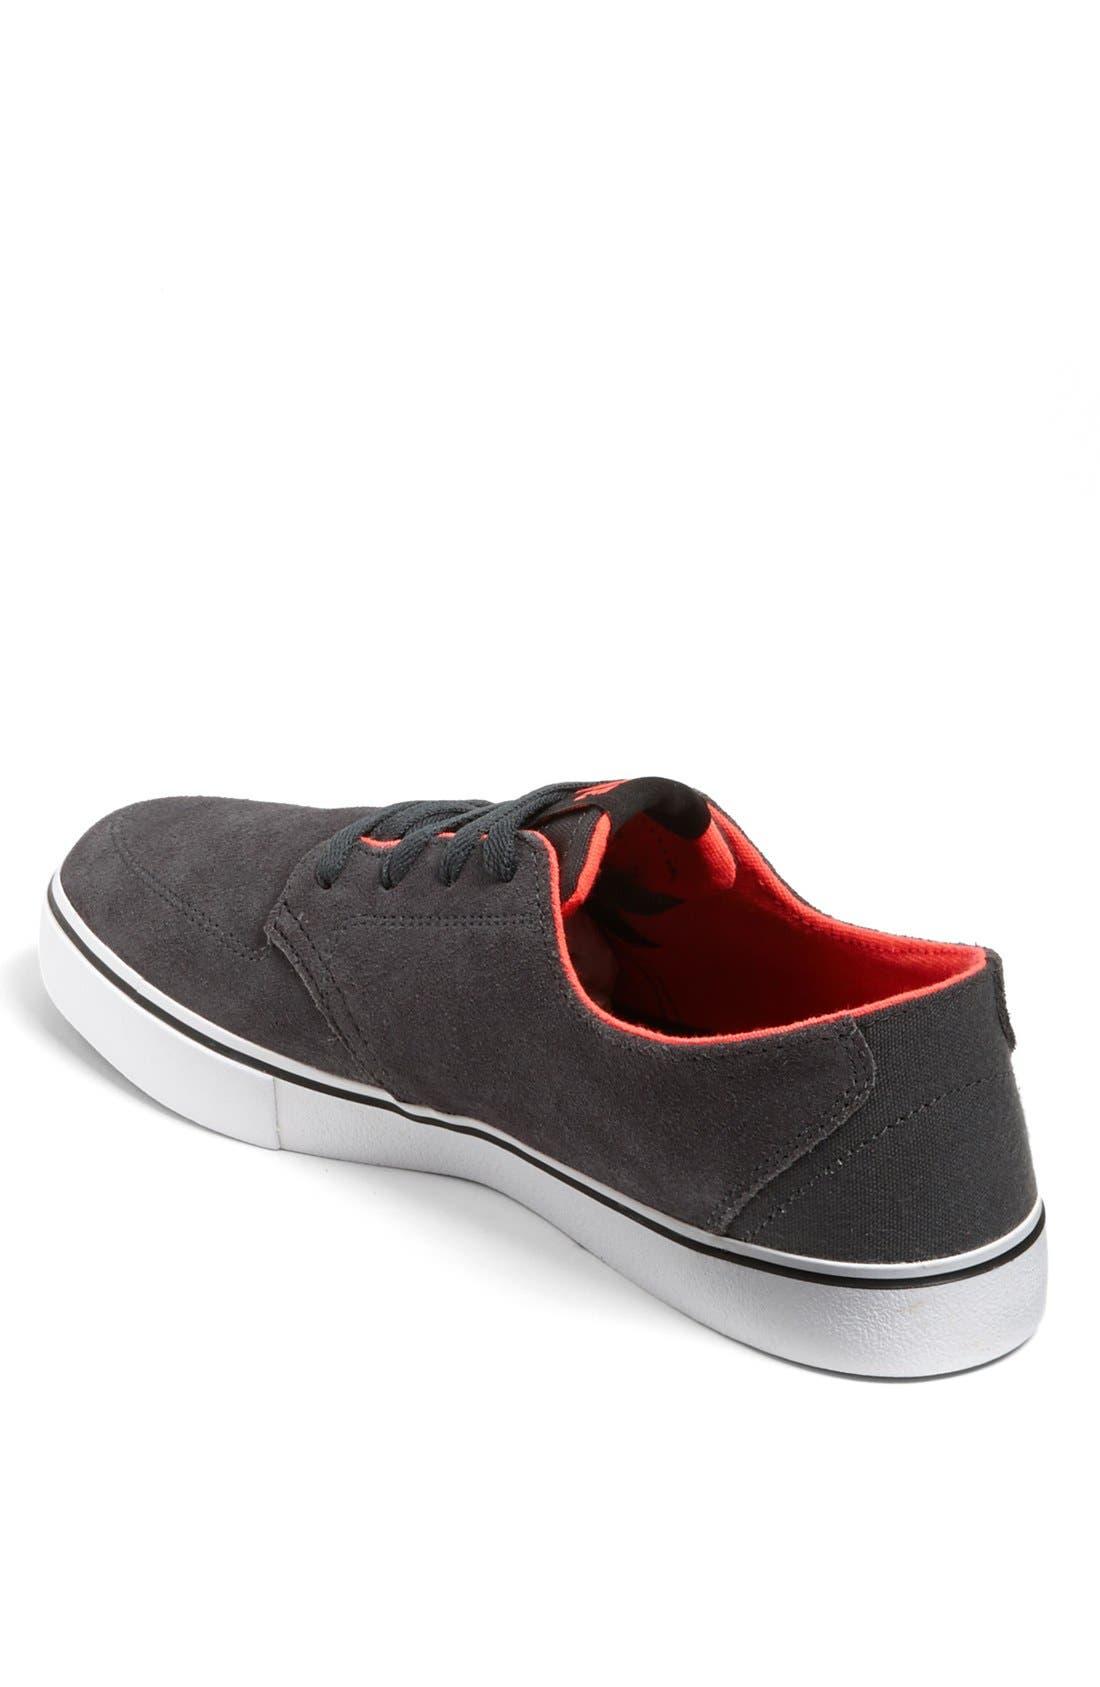 Alternate Image 2  - Nike 'Braata LR' Sneaker (Men)